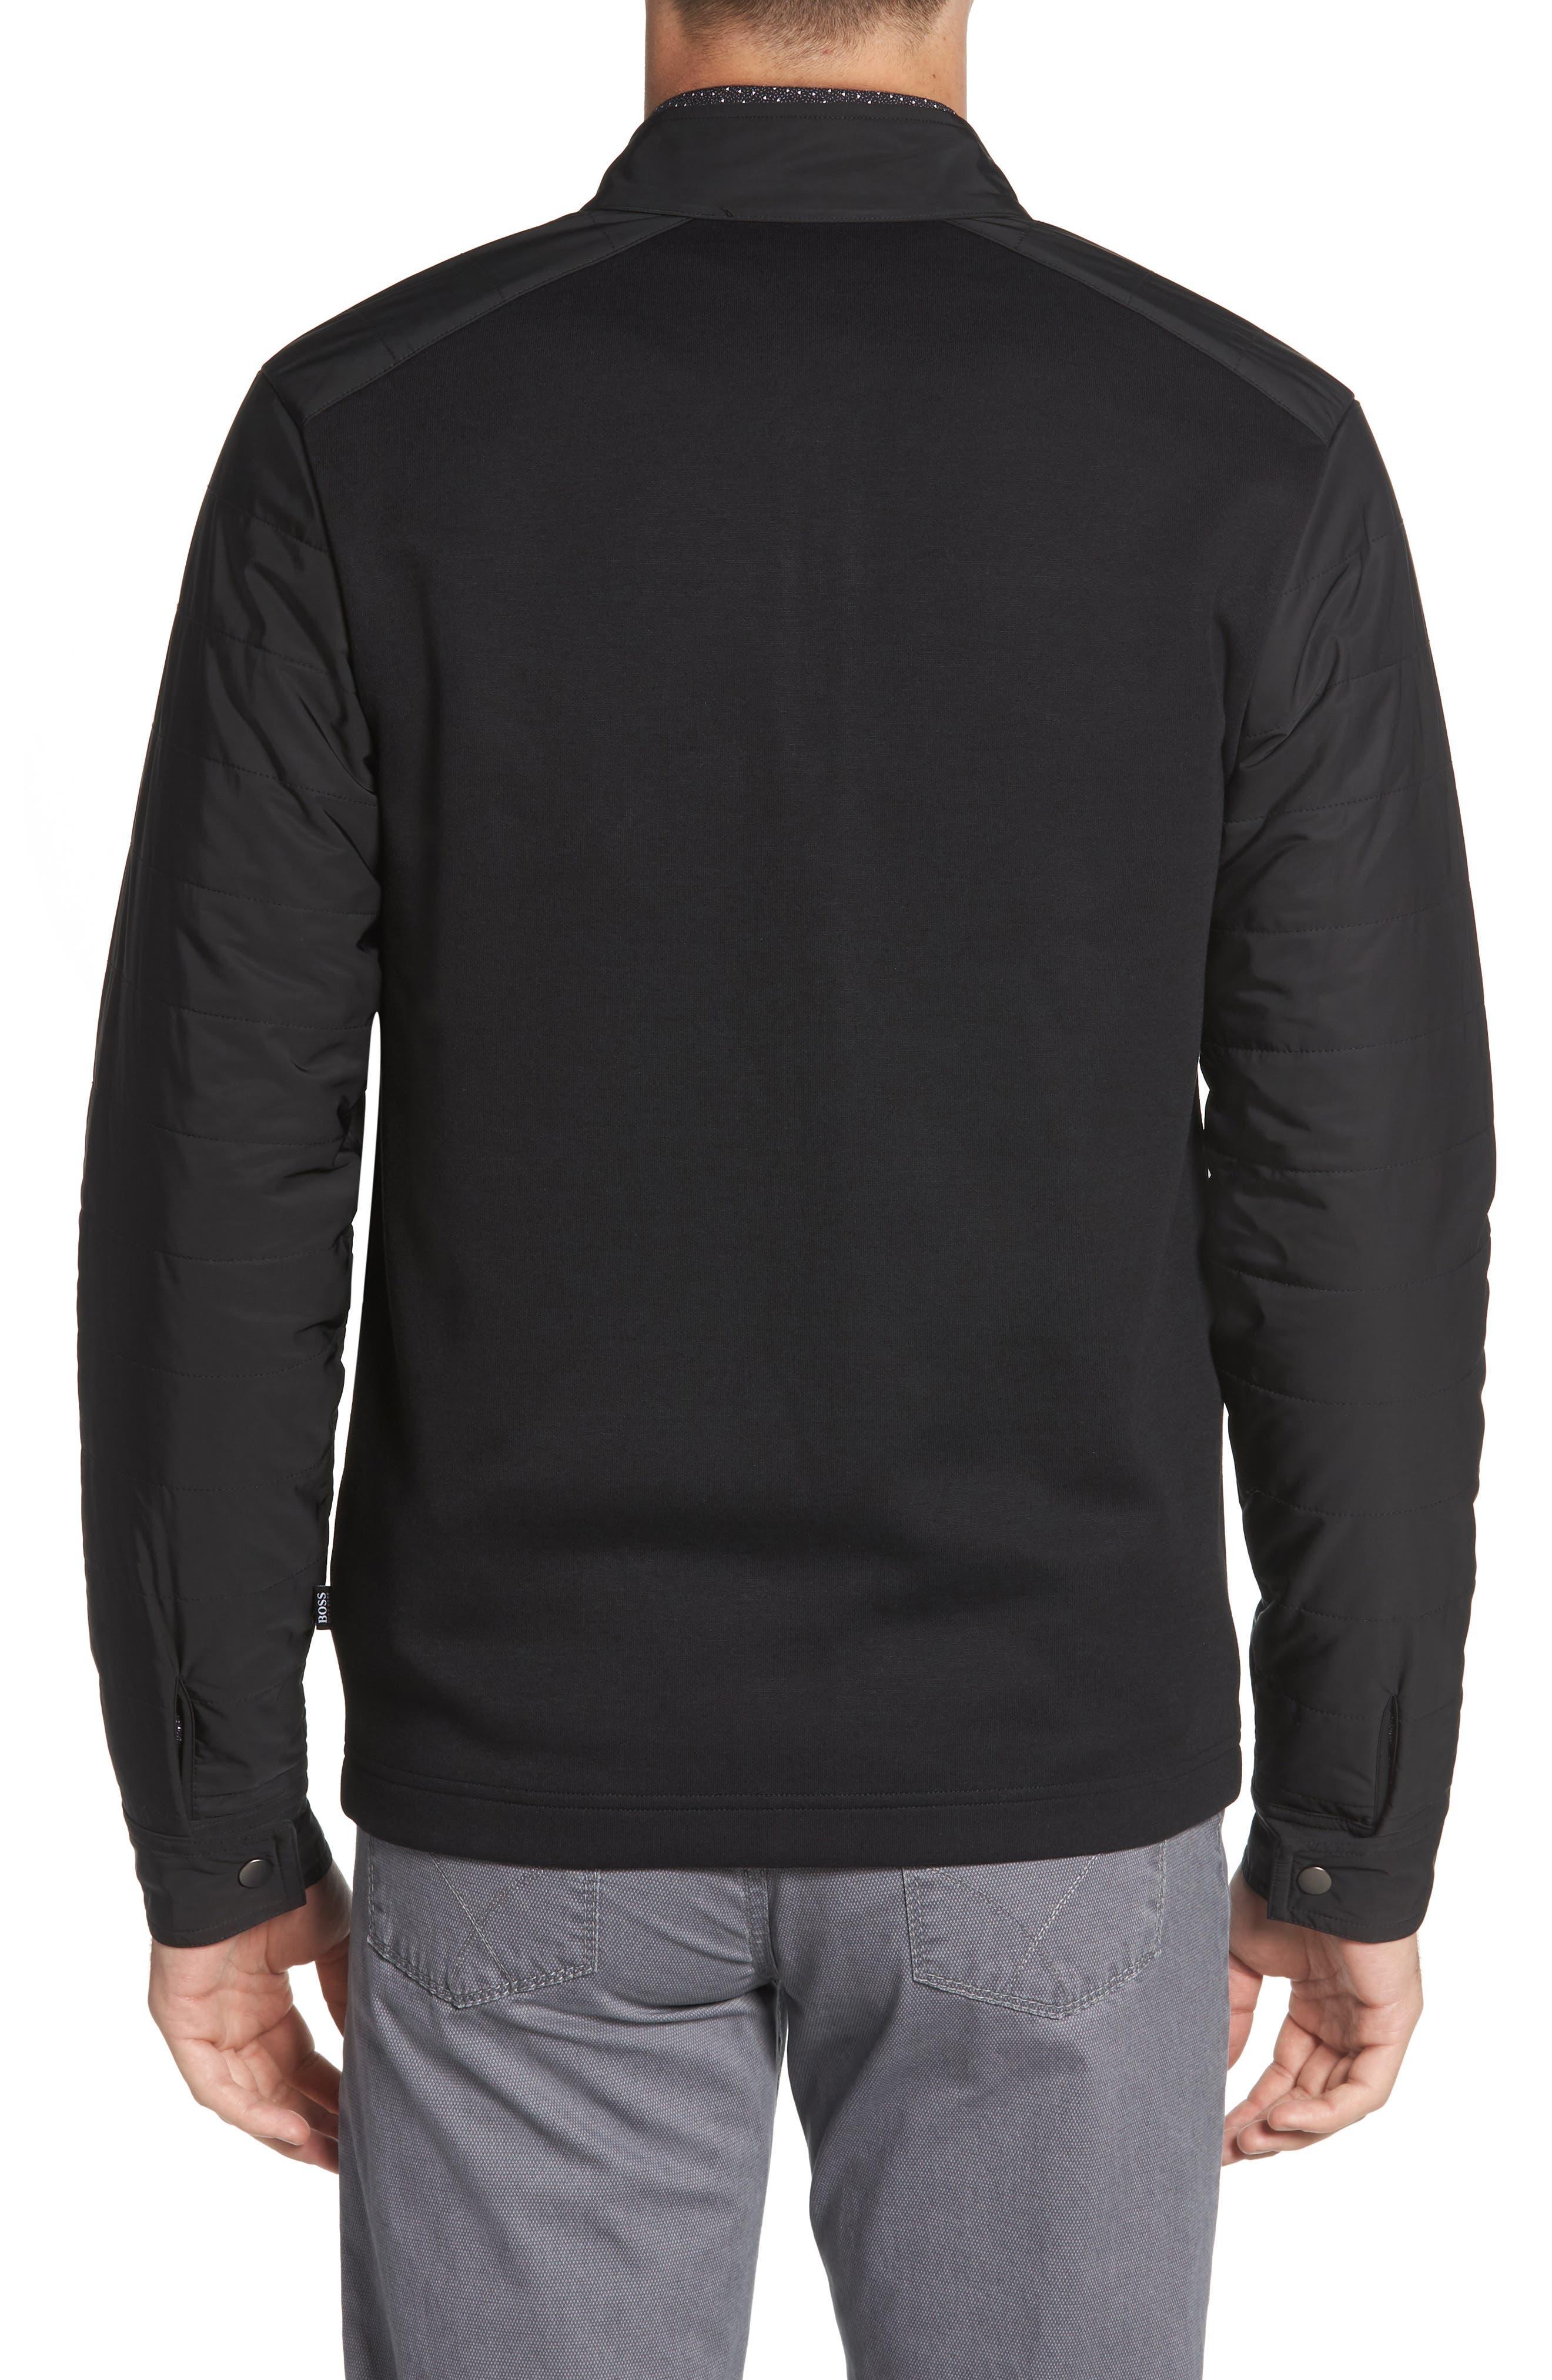 Soule Slim Fit Moto Jacket,                             Alternate thumbnail 2, color,                             BLACK